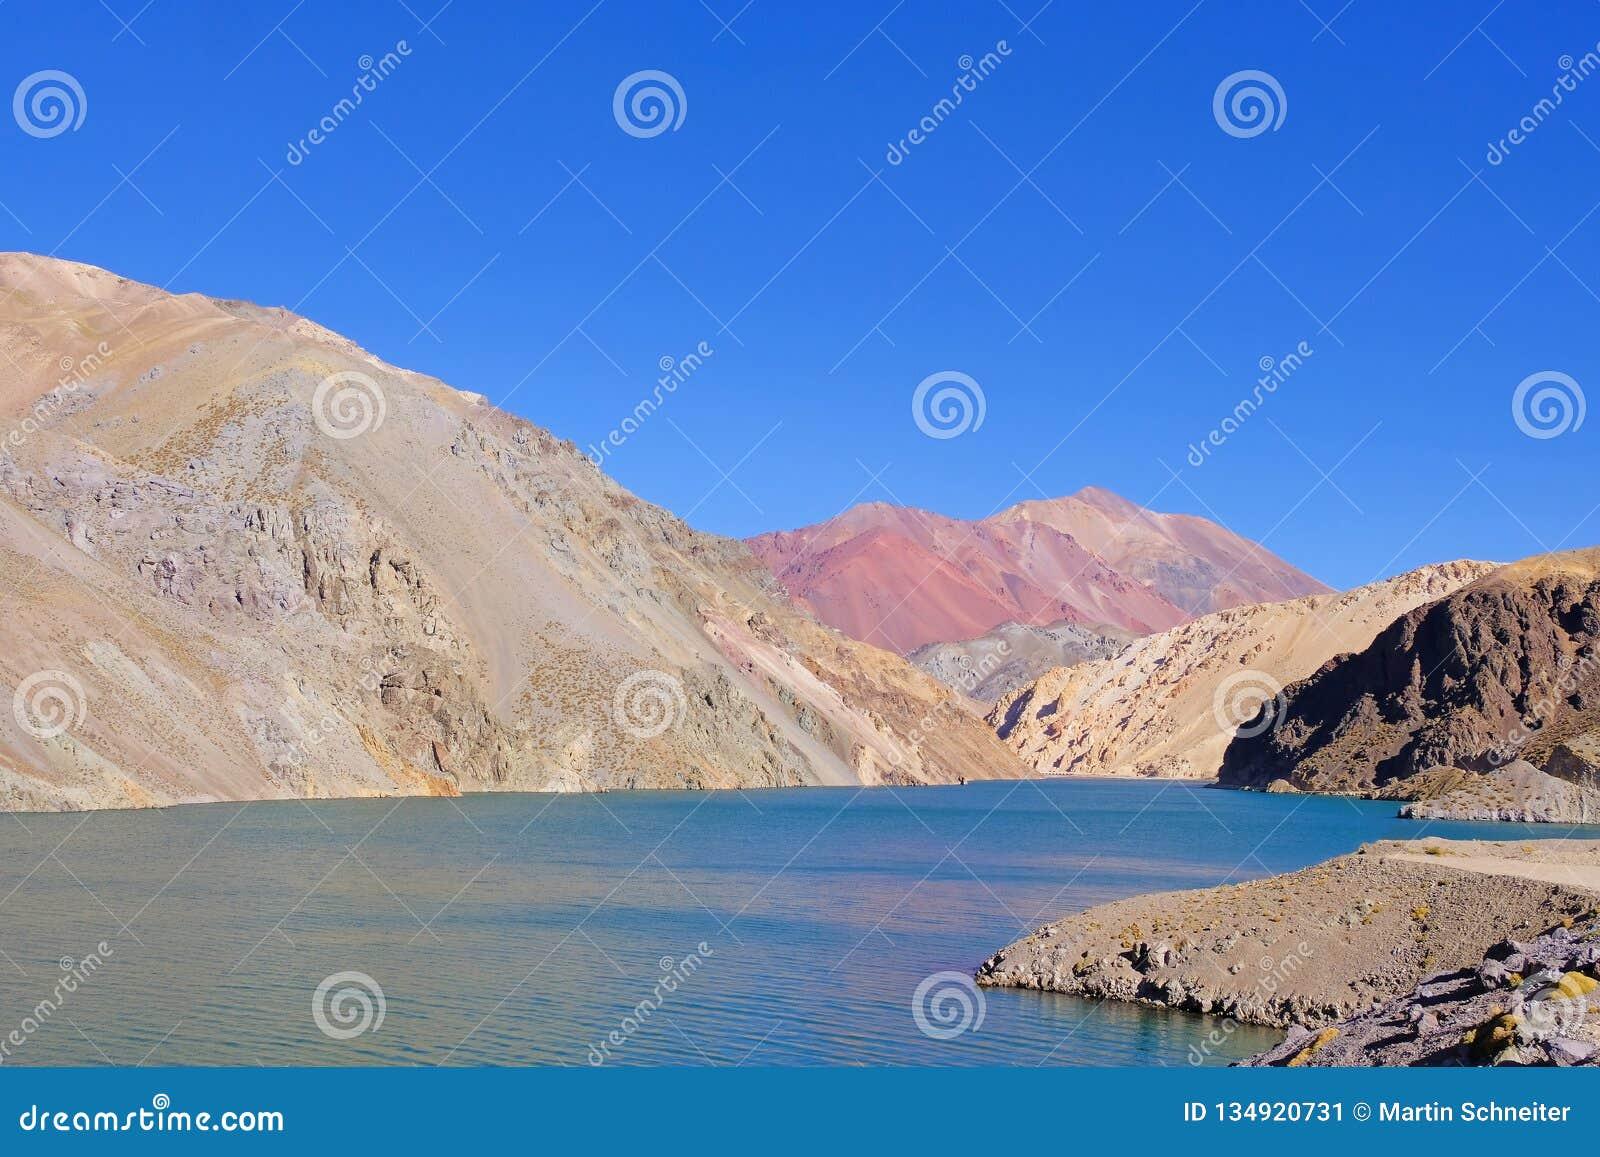 Laguna Agua Negra lagune met Andesbergen bij de weg aan Paso Agua DE Negra, Elqui-vallei, Vicuna, Chili